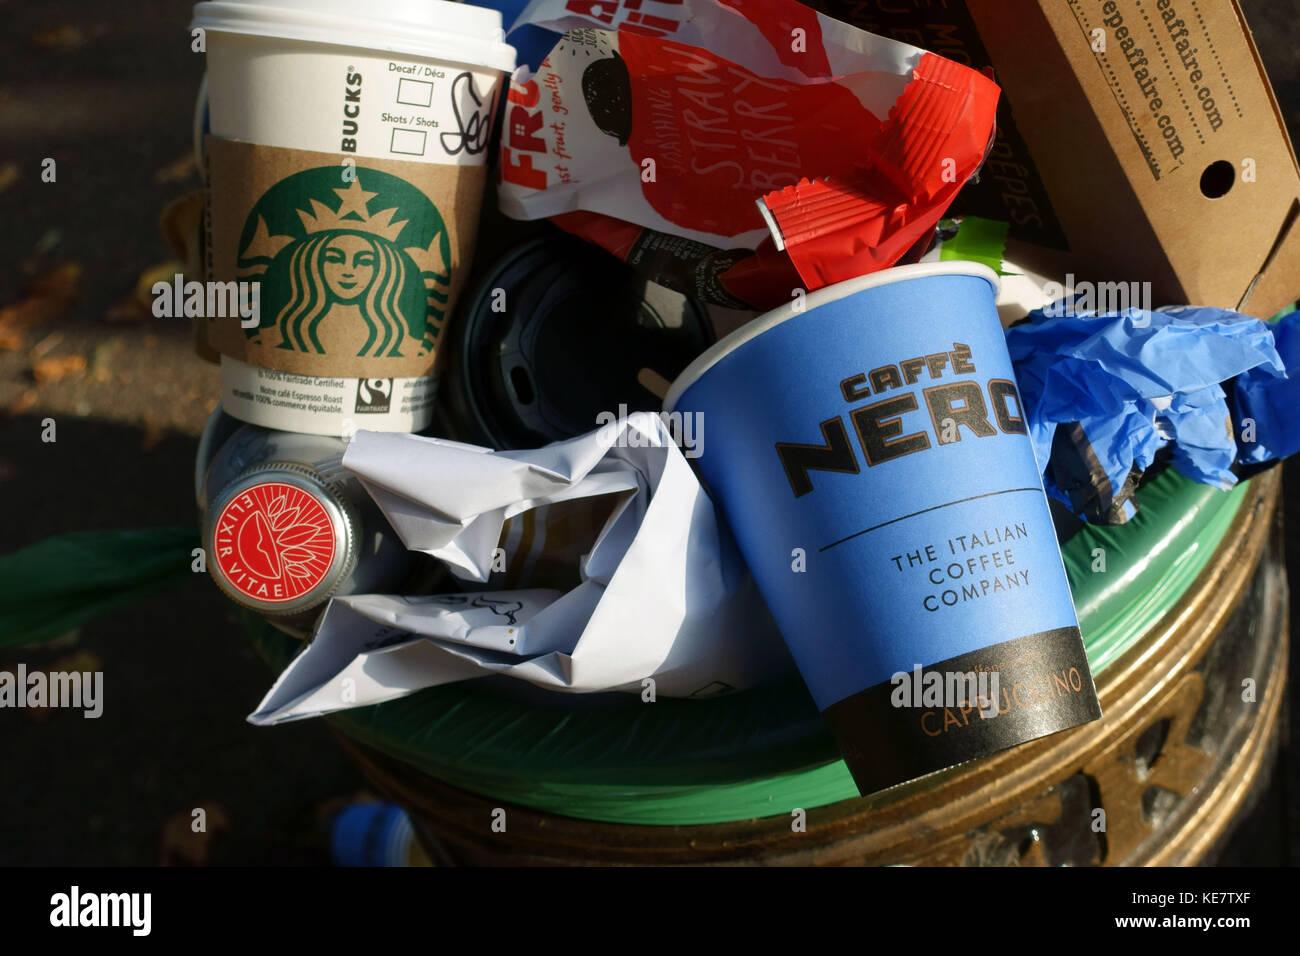 Non-recyclable coffee shop take away cups in street rubbish bin, London - Stock Image